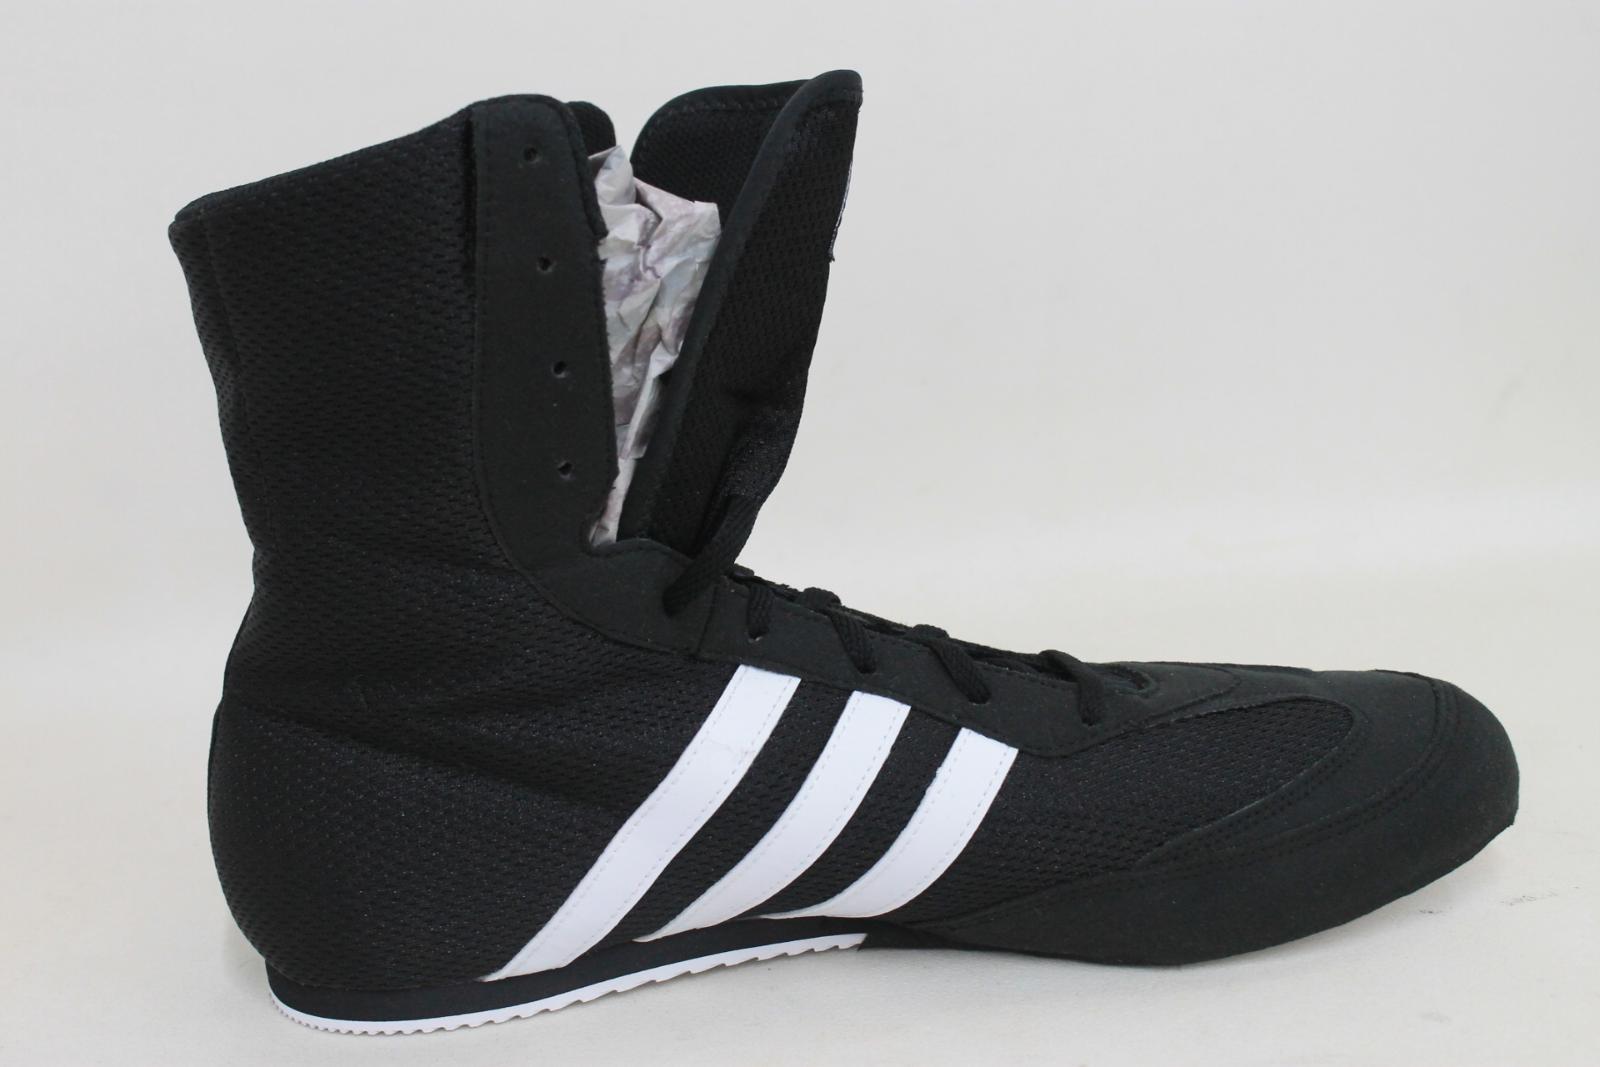 sports shoes 4b8a6 8d2aa ADIDAS-Men-039-s-Box-Hog-2-Shoes-